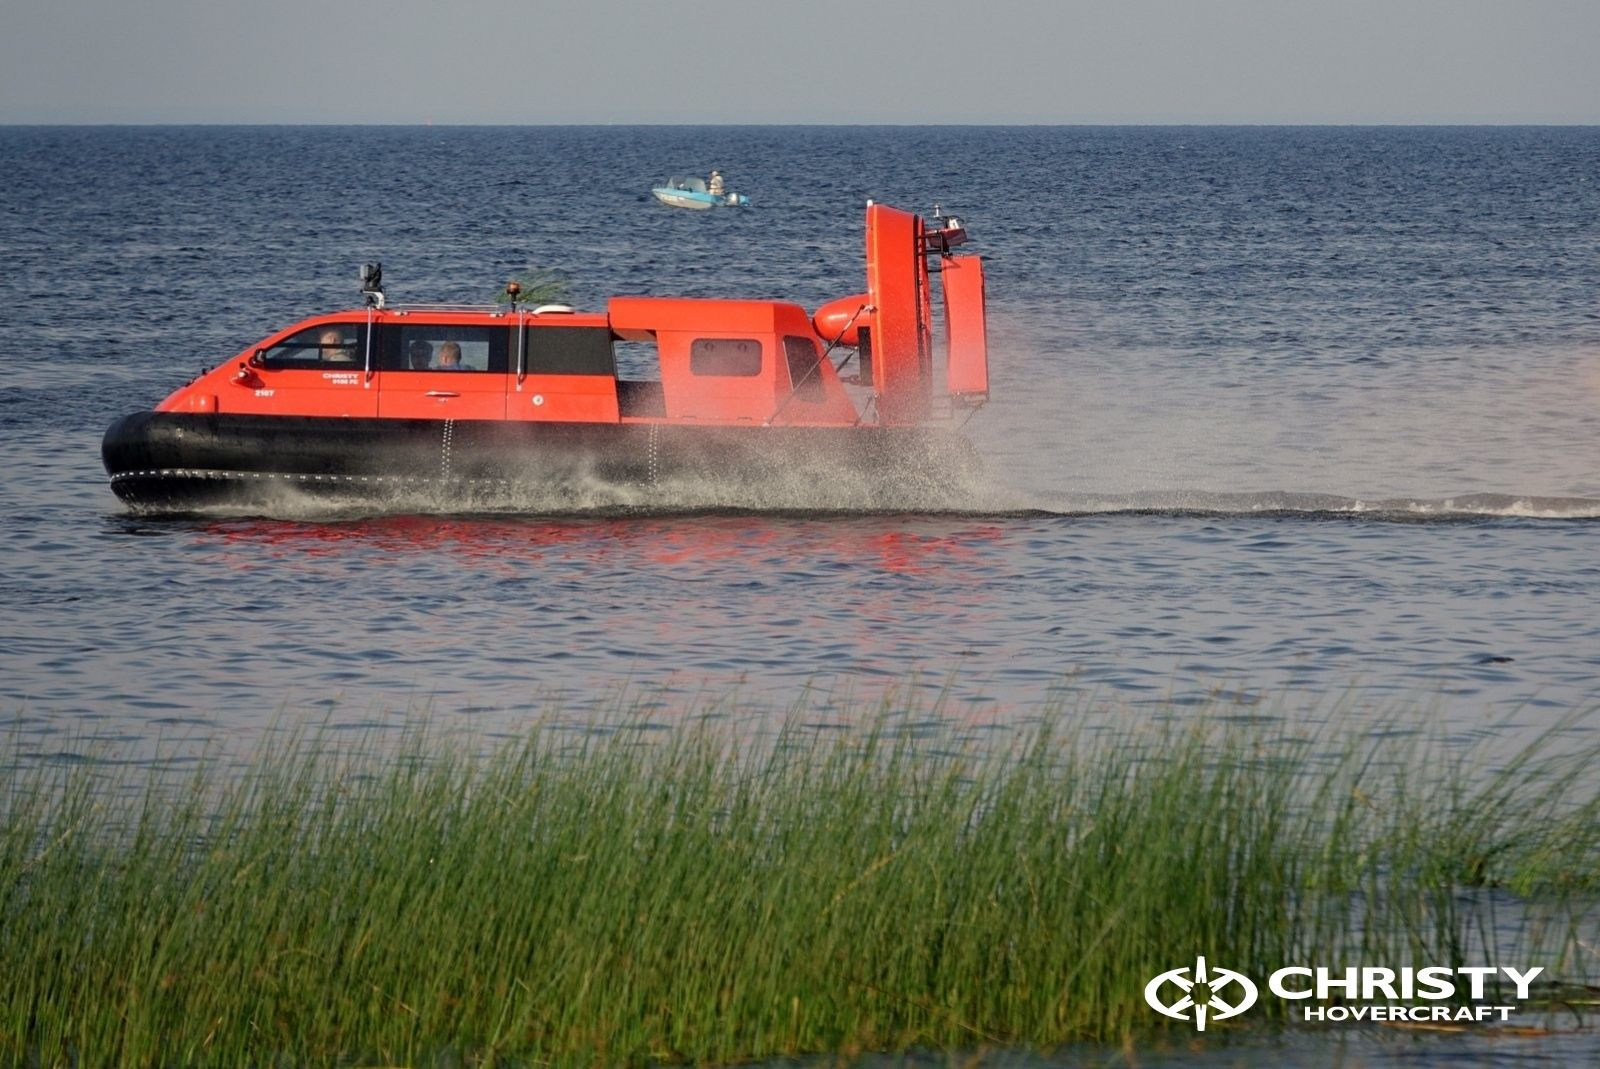 Тест-драйв катера-амфибии Christy 8186 FC Duct для правительства Канады   фото №4